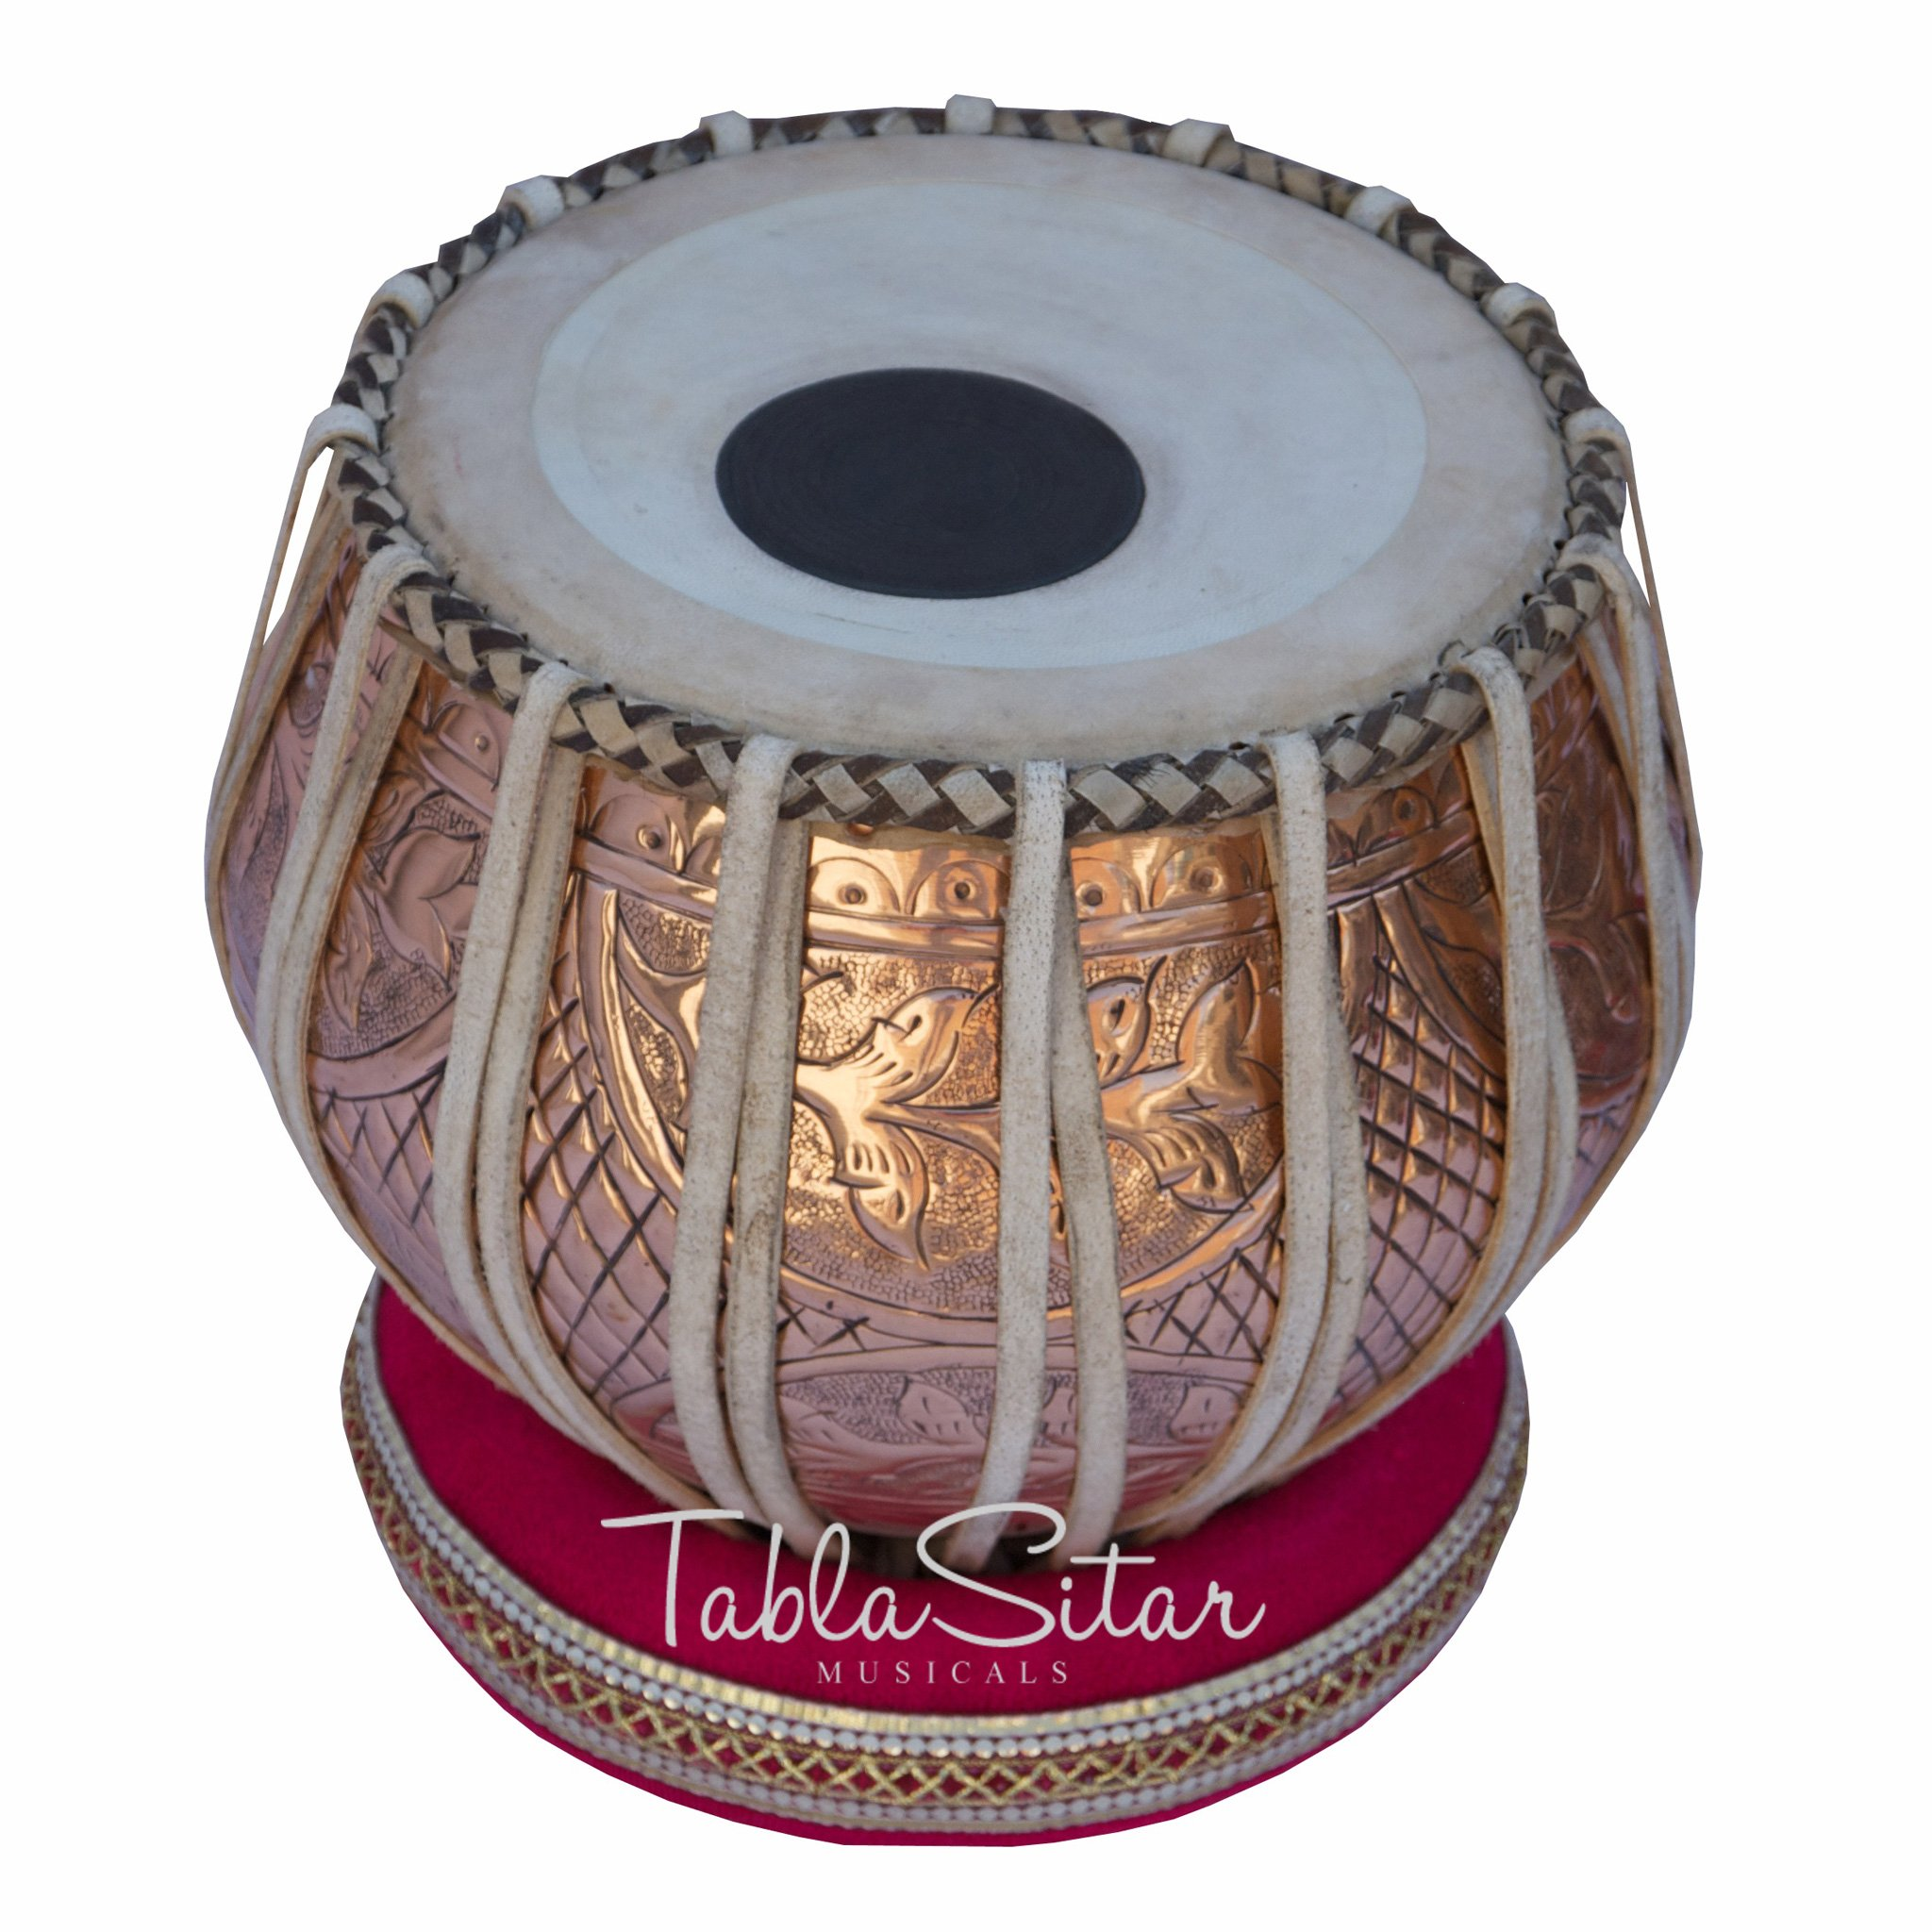 Tabla Drum Set by Maharaja Musicals, Professional, 3.5 Kg Copper Bayan - Designer Carving, Sheesham Tabla Dayan, Padded Bag, Book, Hammer, Cushions, Cover, Tabla Musical Instrument (PDI-CJH) by Maharaja Musicals (Image #3)